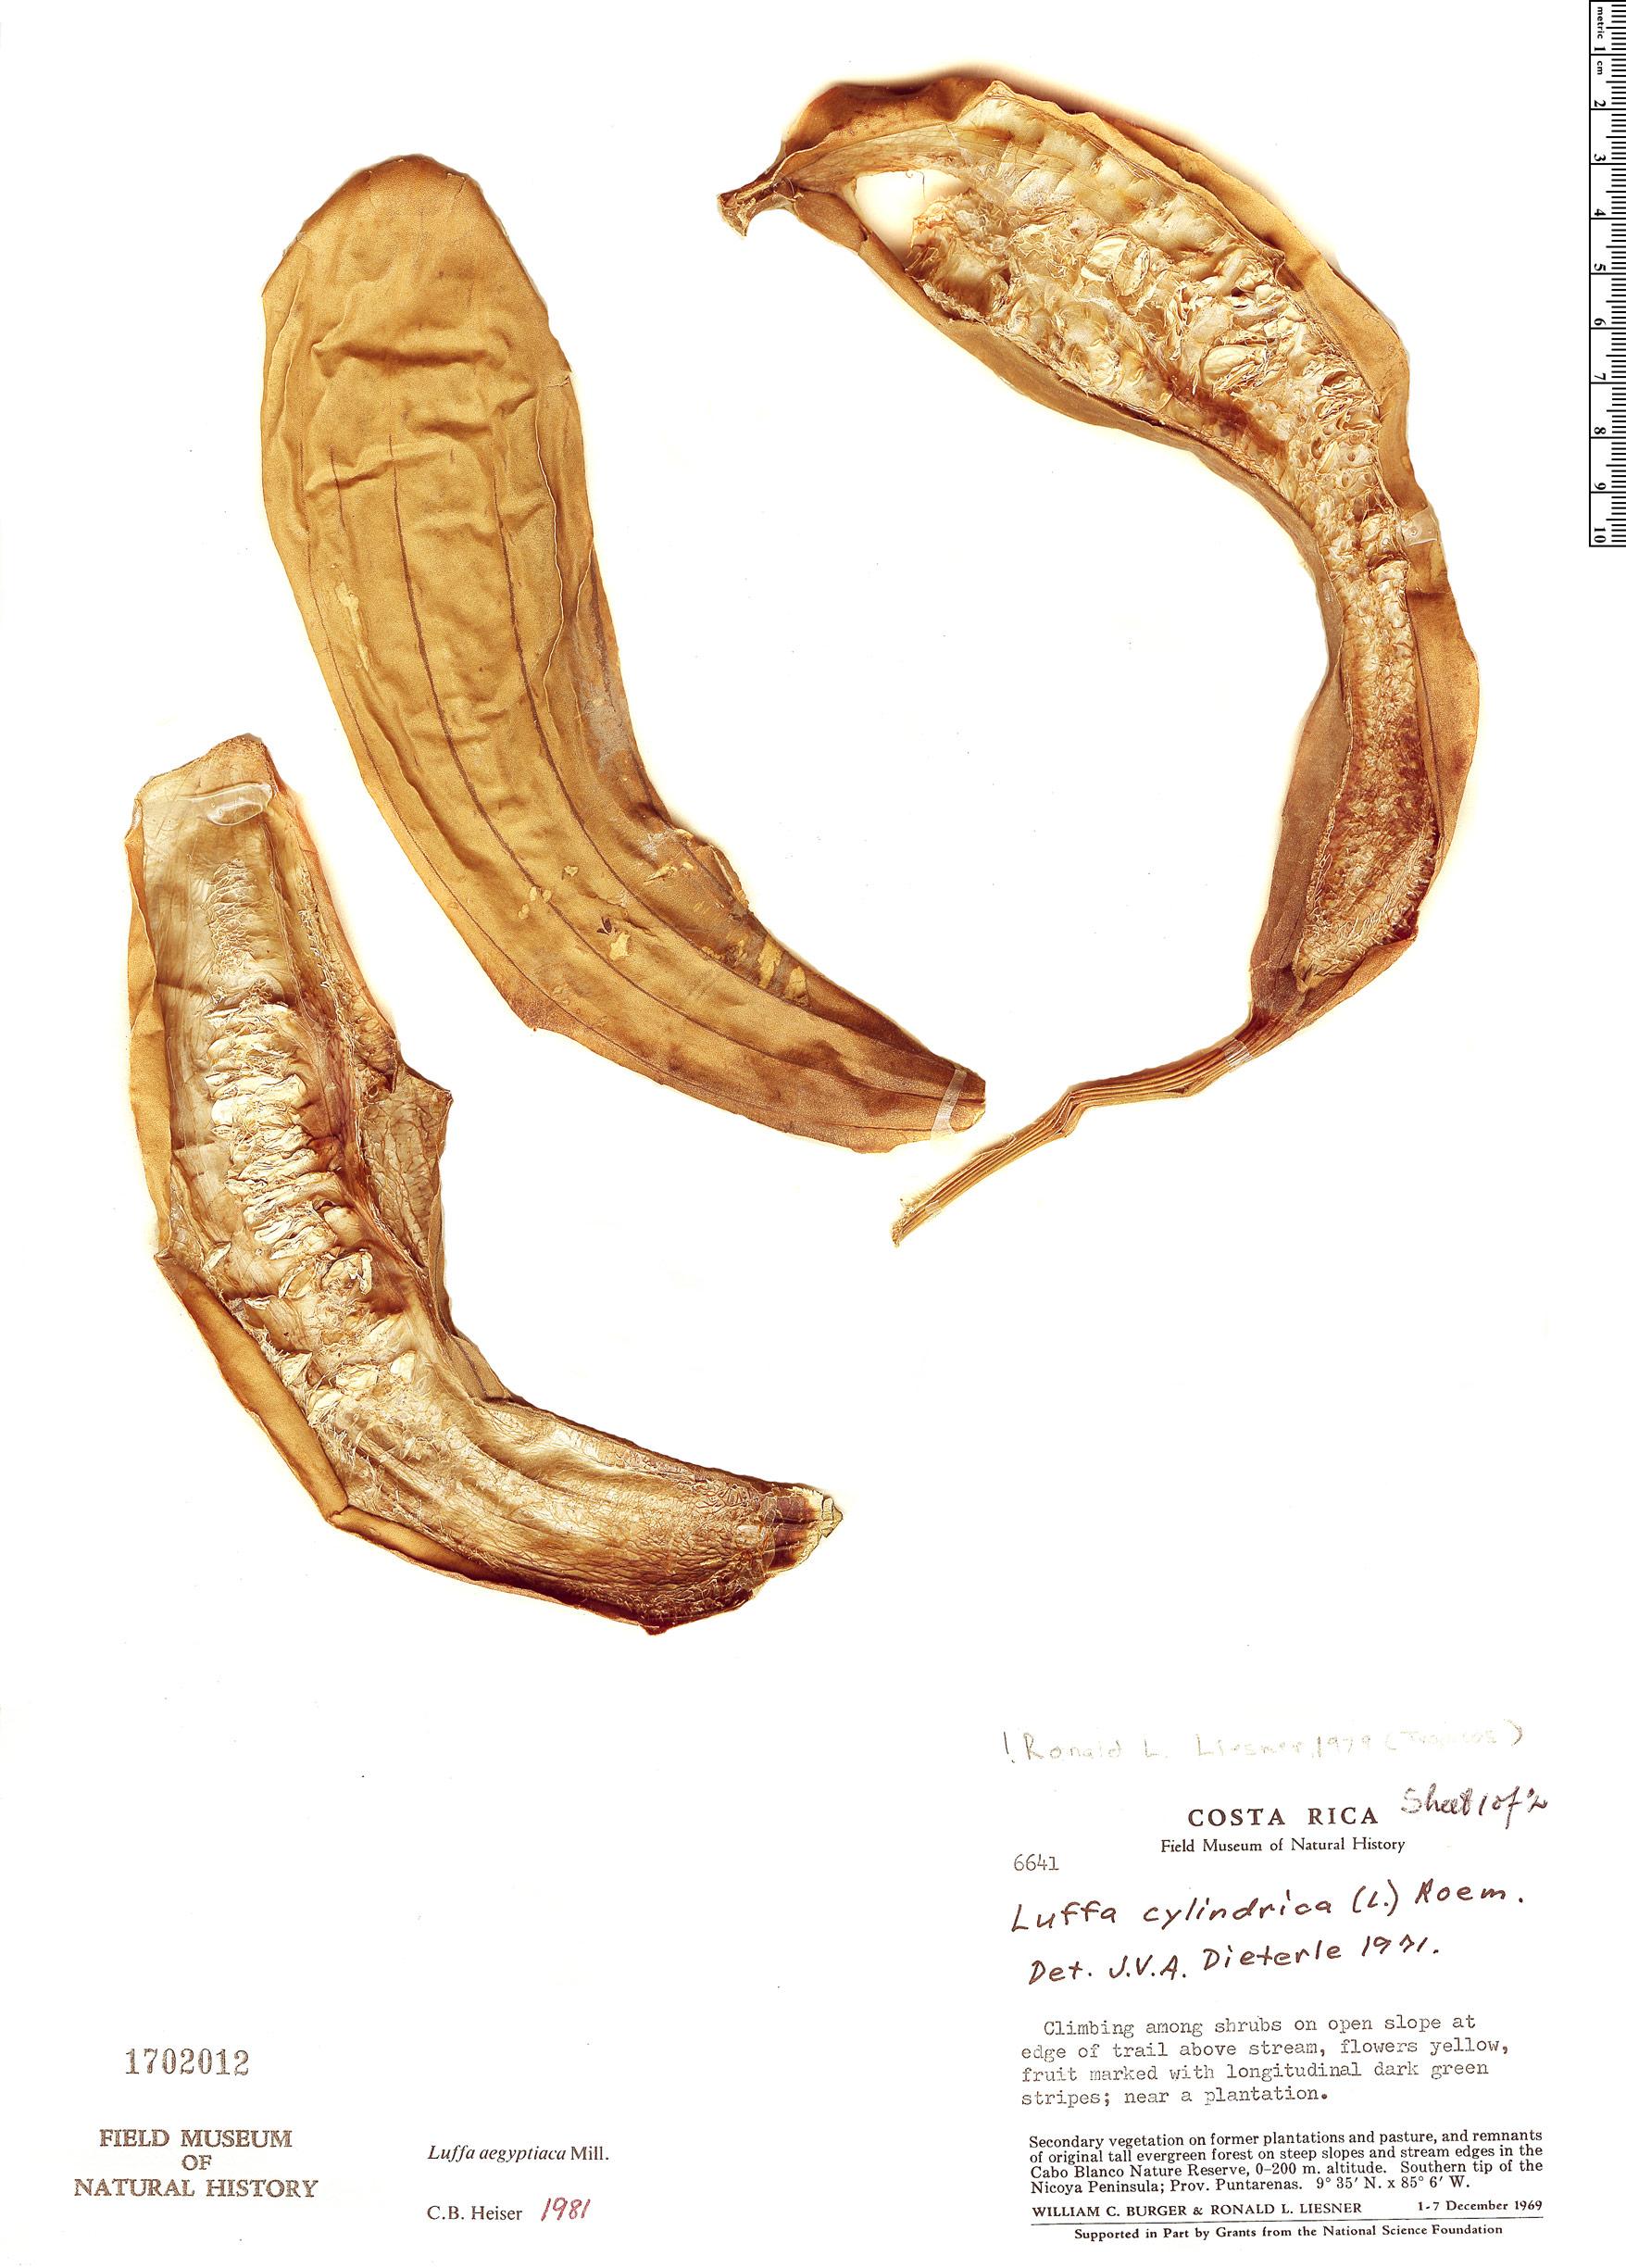 Specimen: Luffa cylindrica